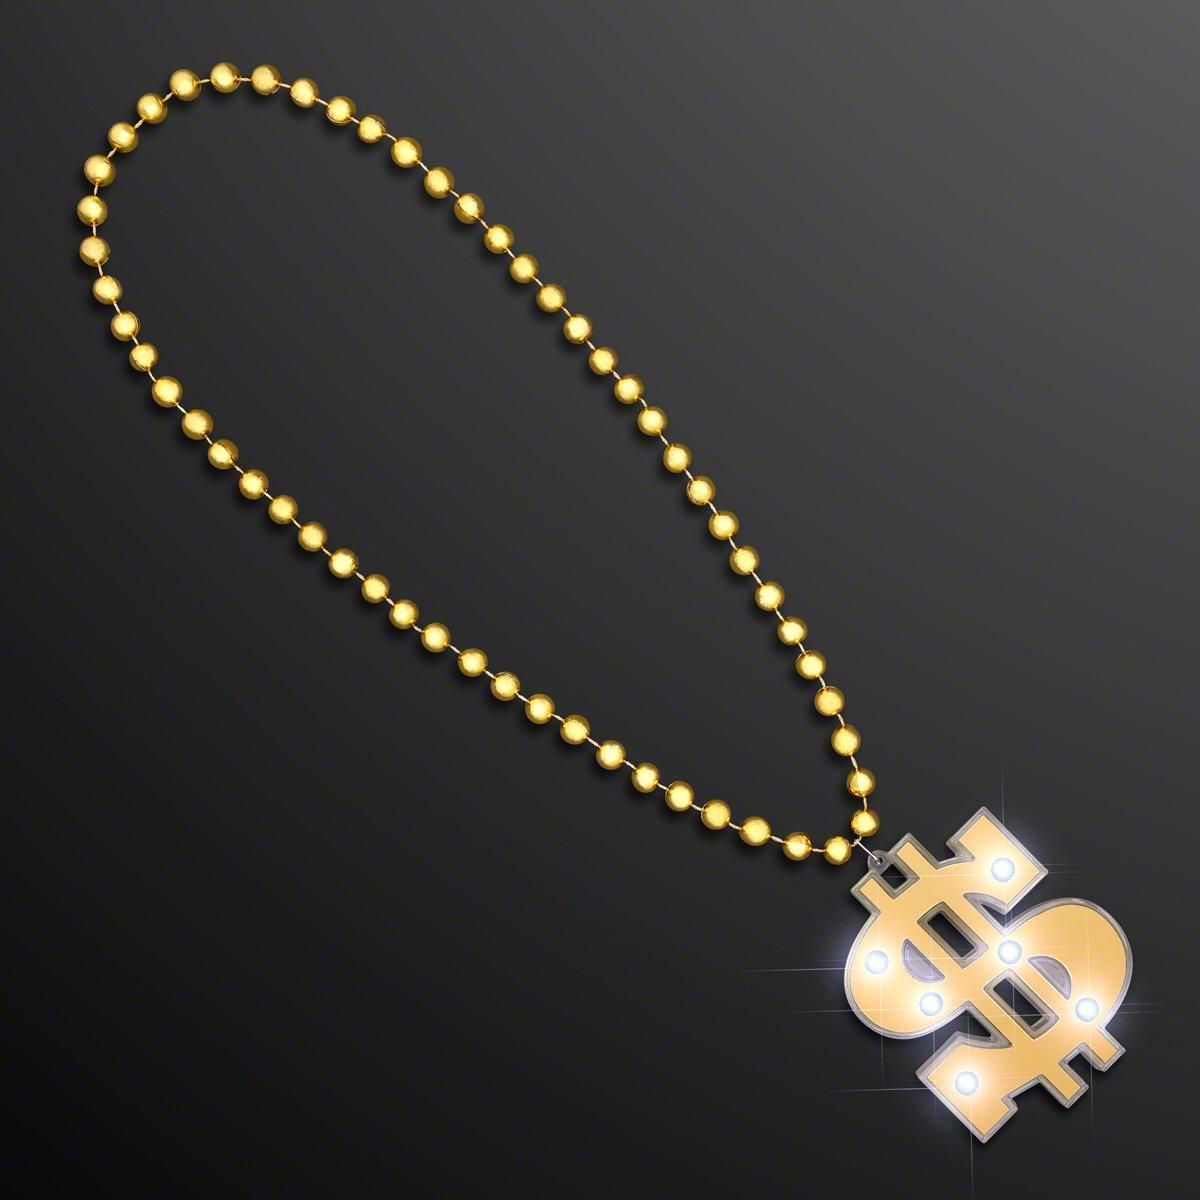 Light Up Dollar Sign Bling on Beads Novelty Necklace (Set of 12)